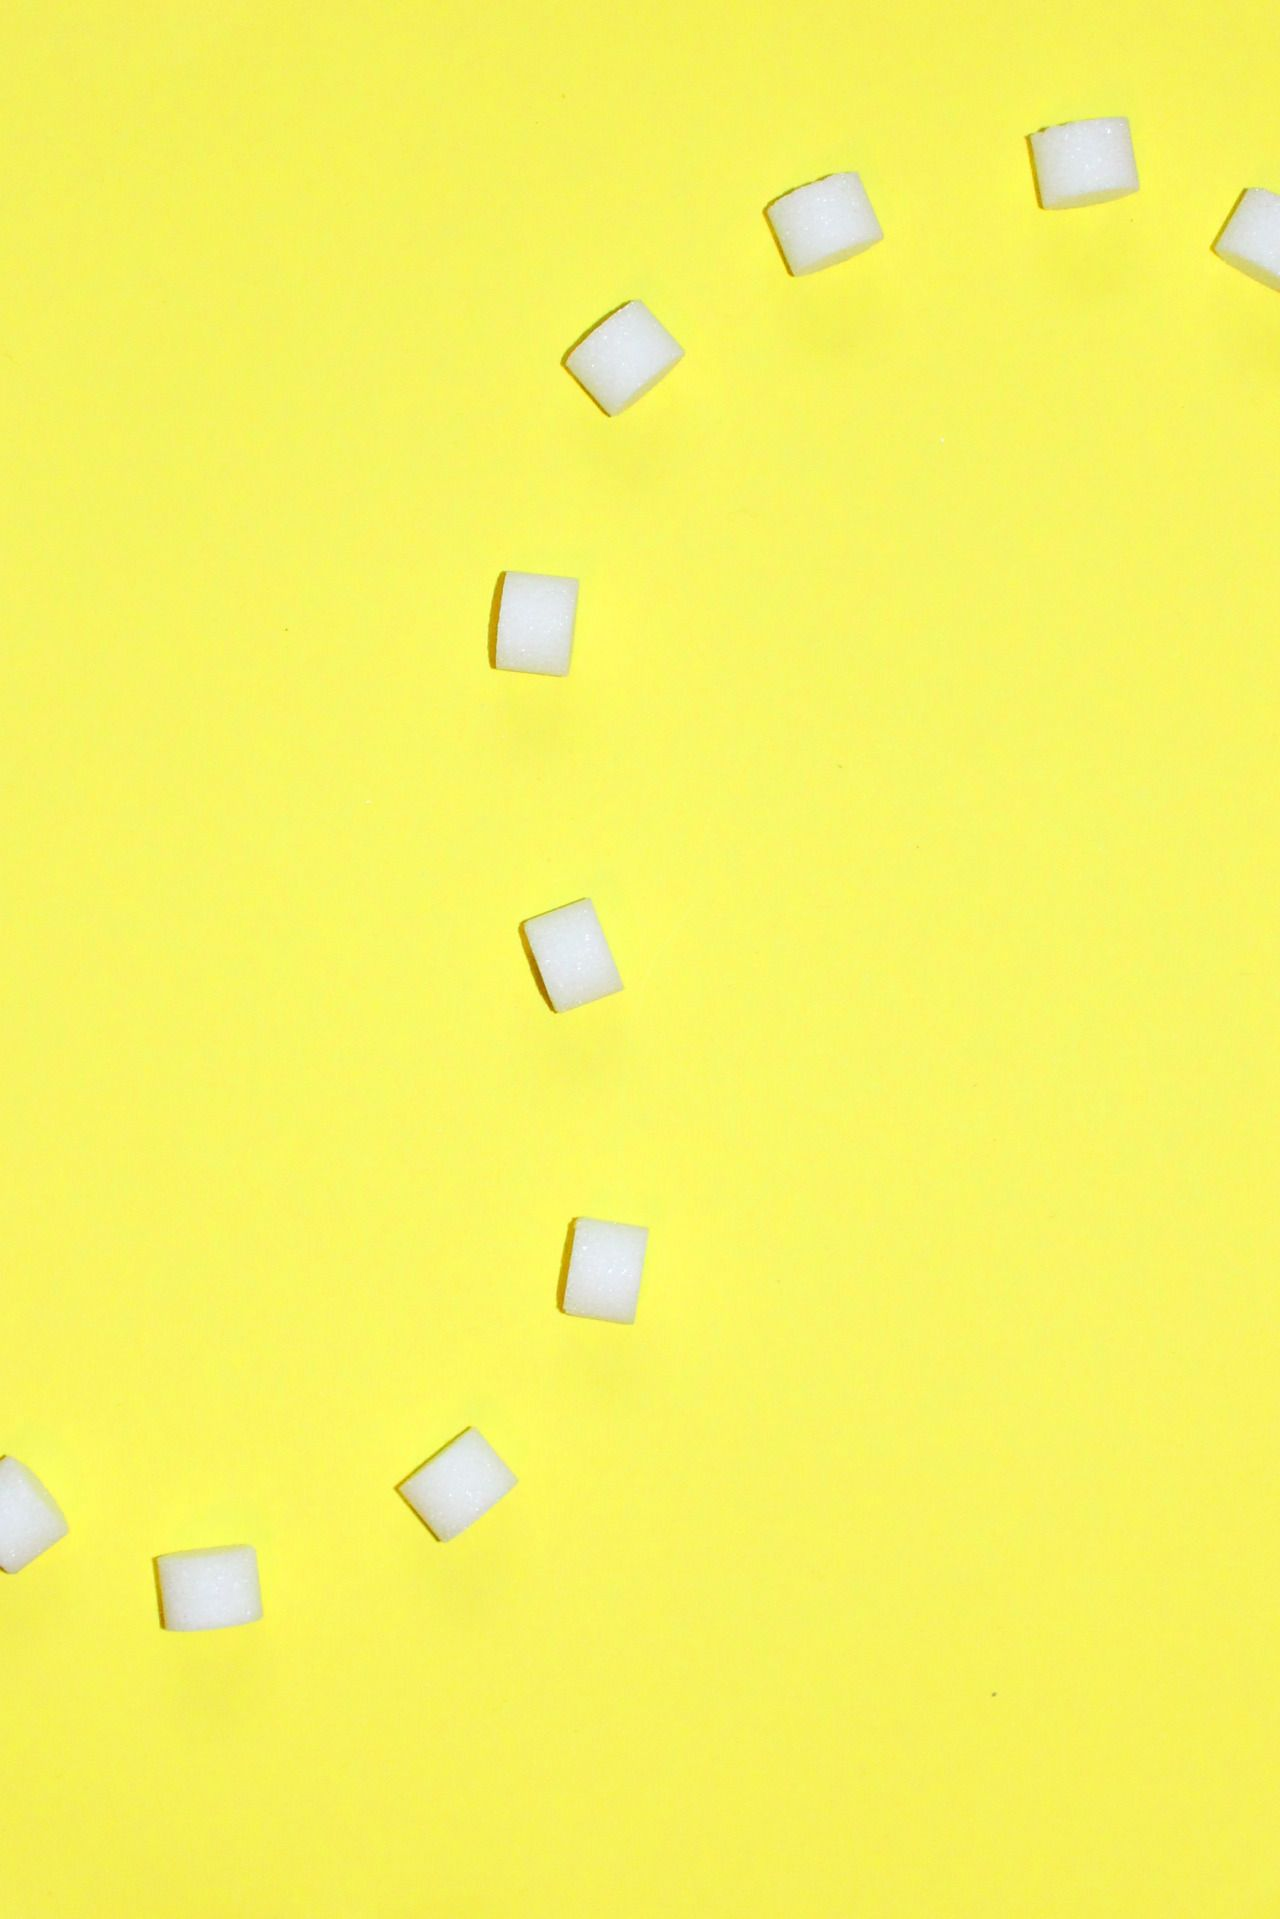 Sugar 04 10/04/2016 - Food Design project